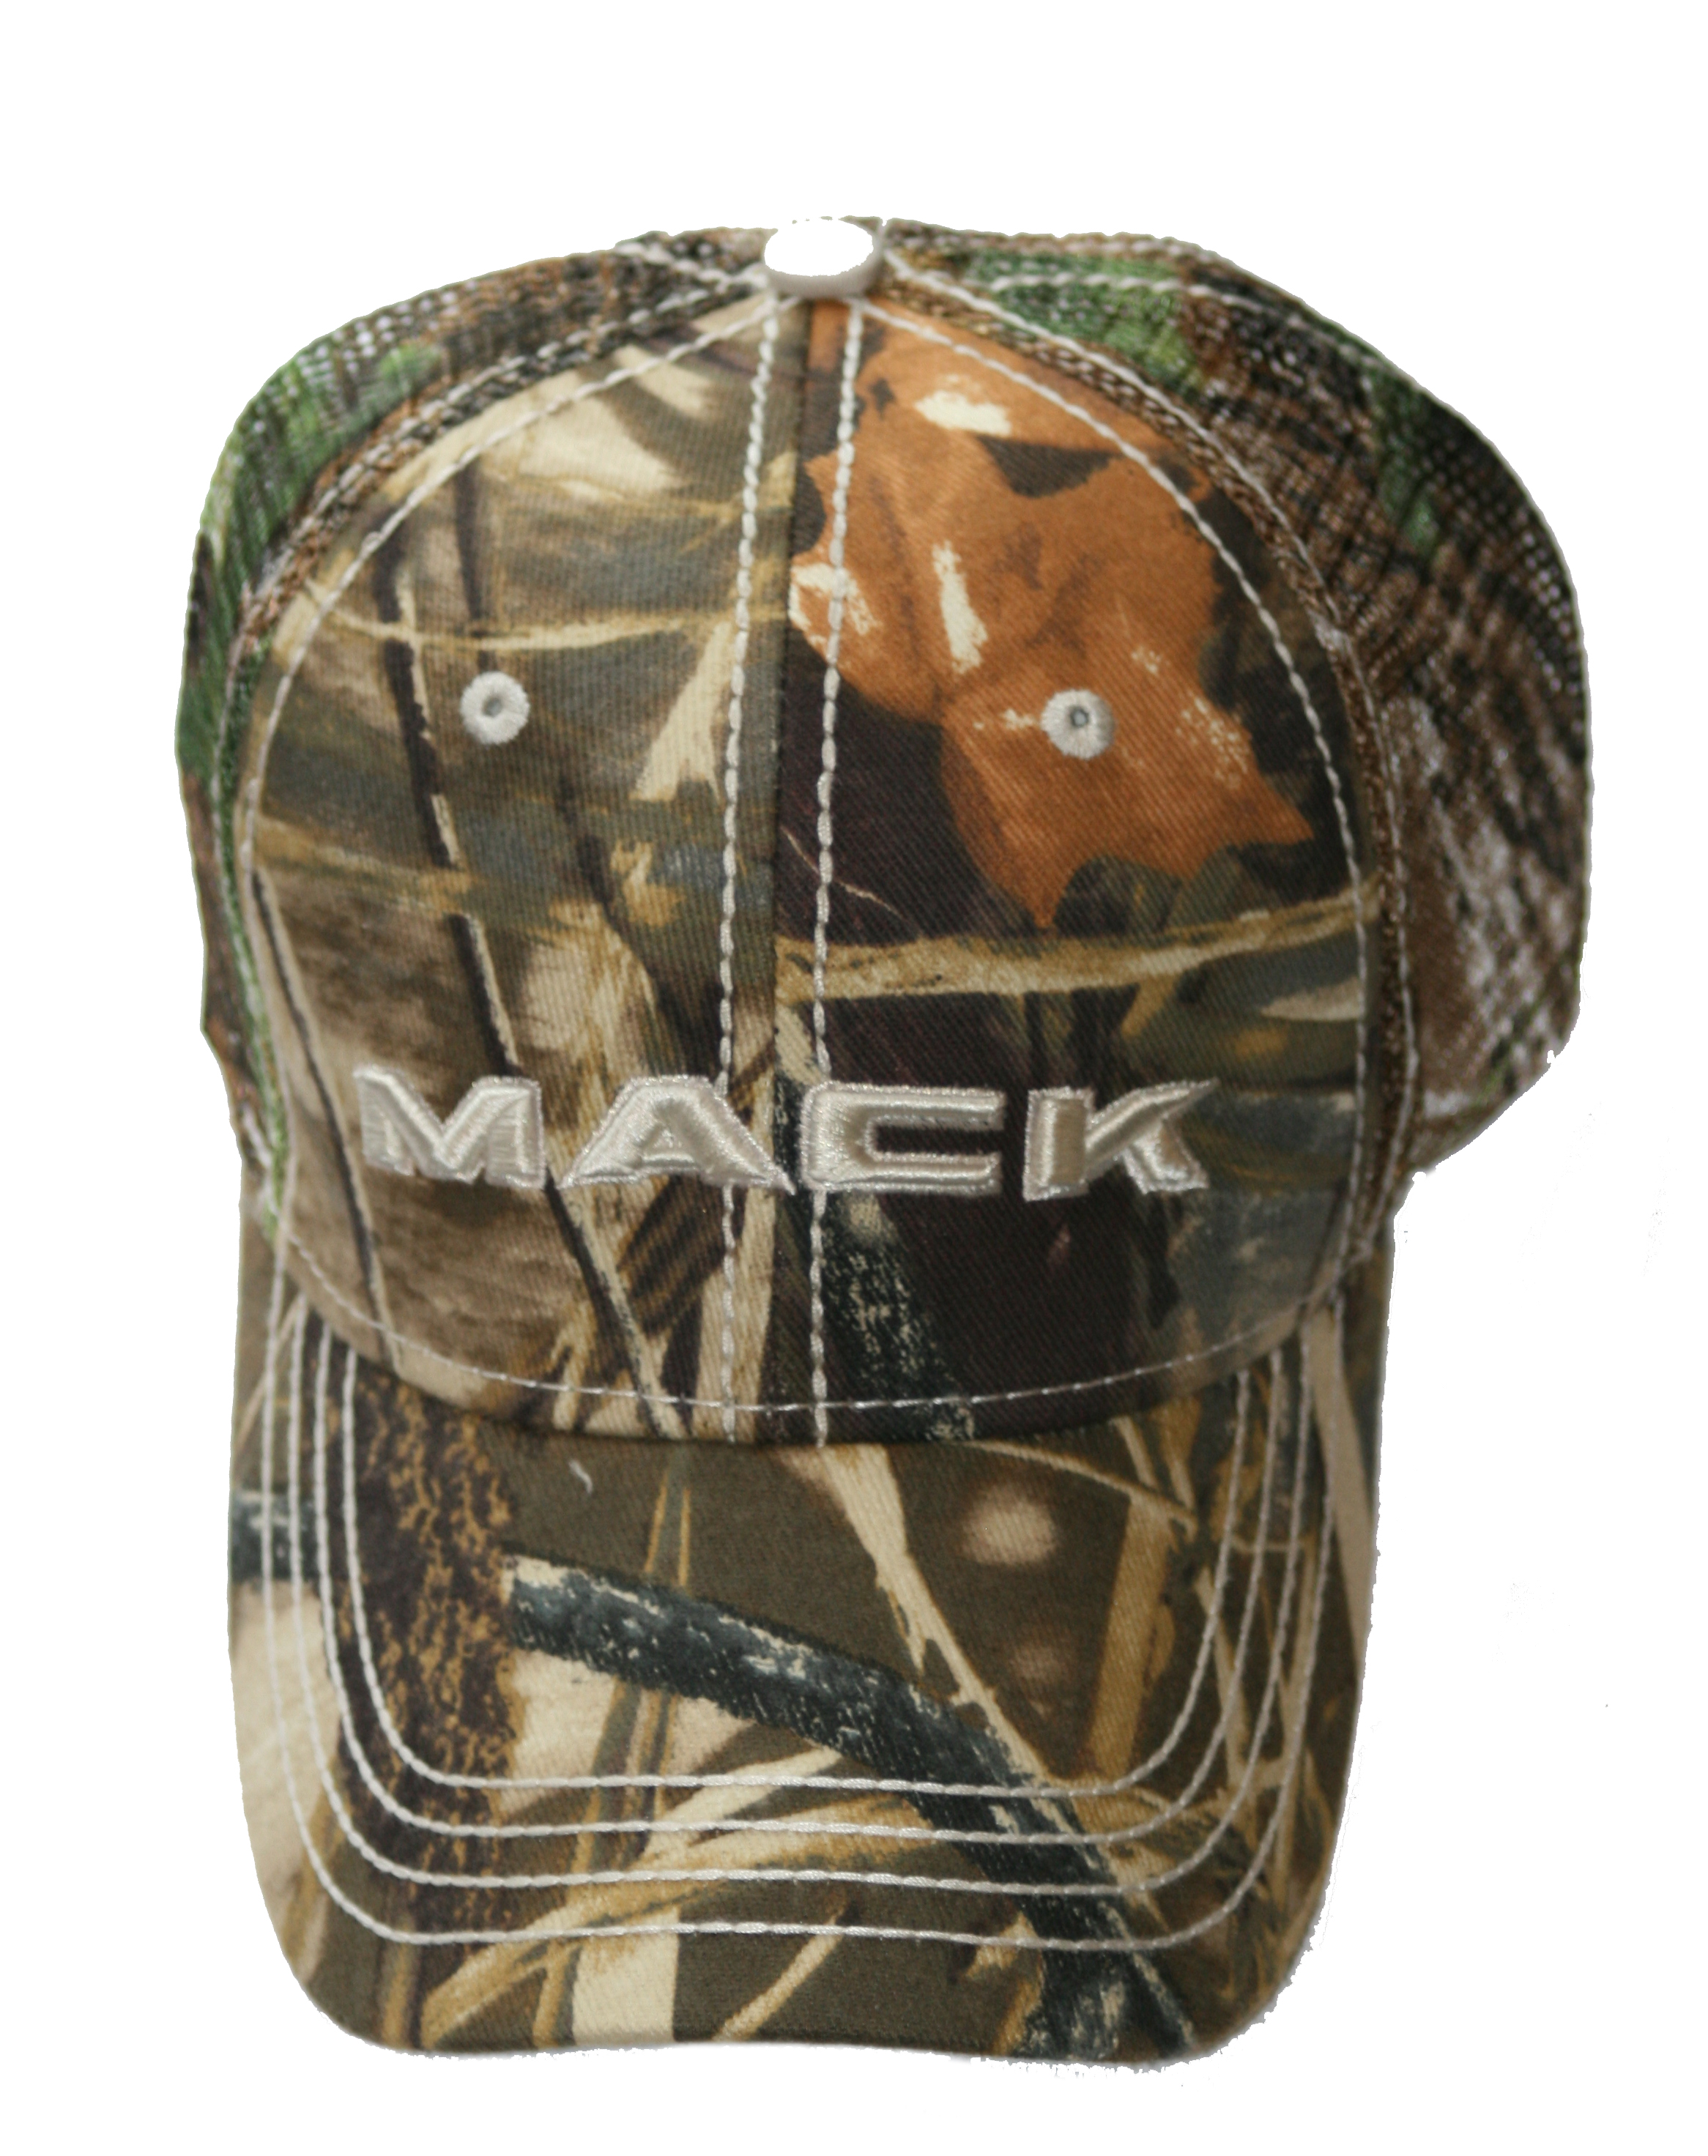 c0f7fe34c88 Authentic Mack Truck Merchandise